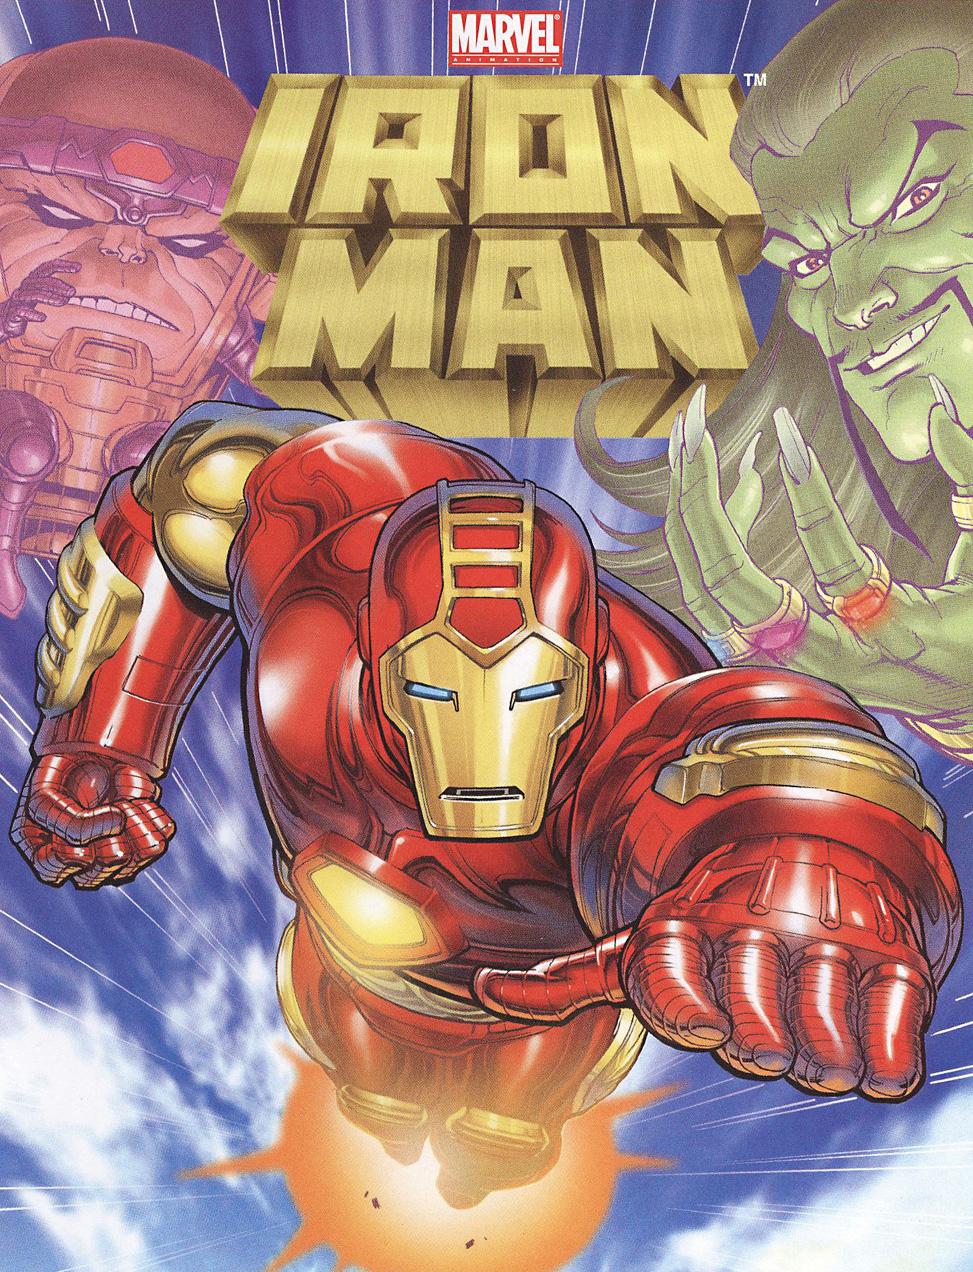 Iron Man (serie animada)